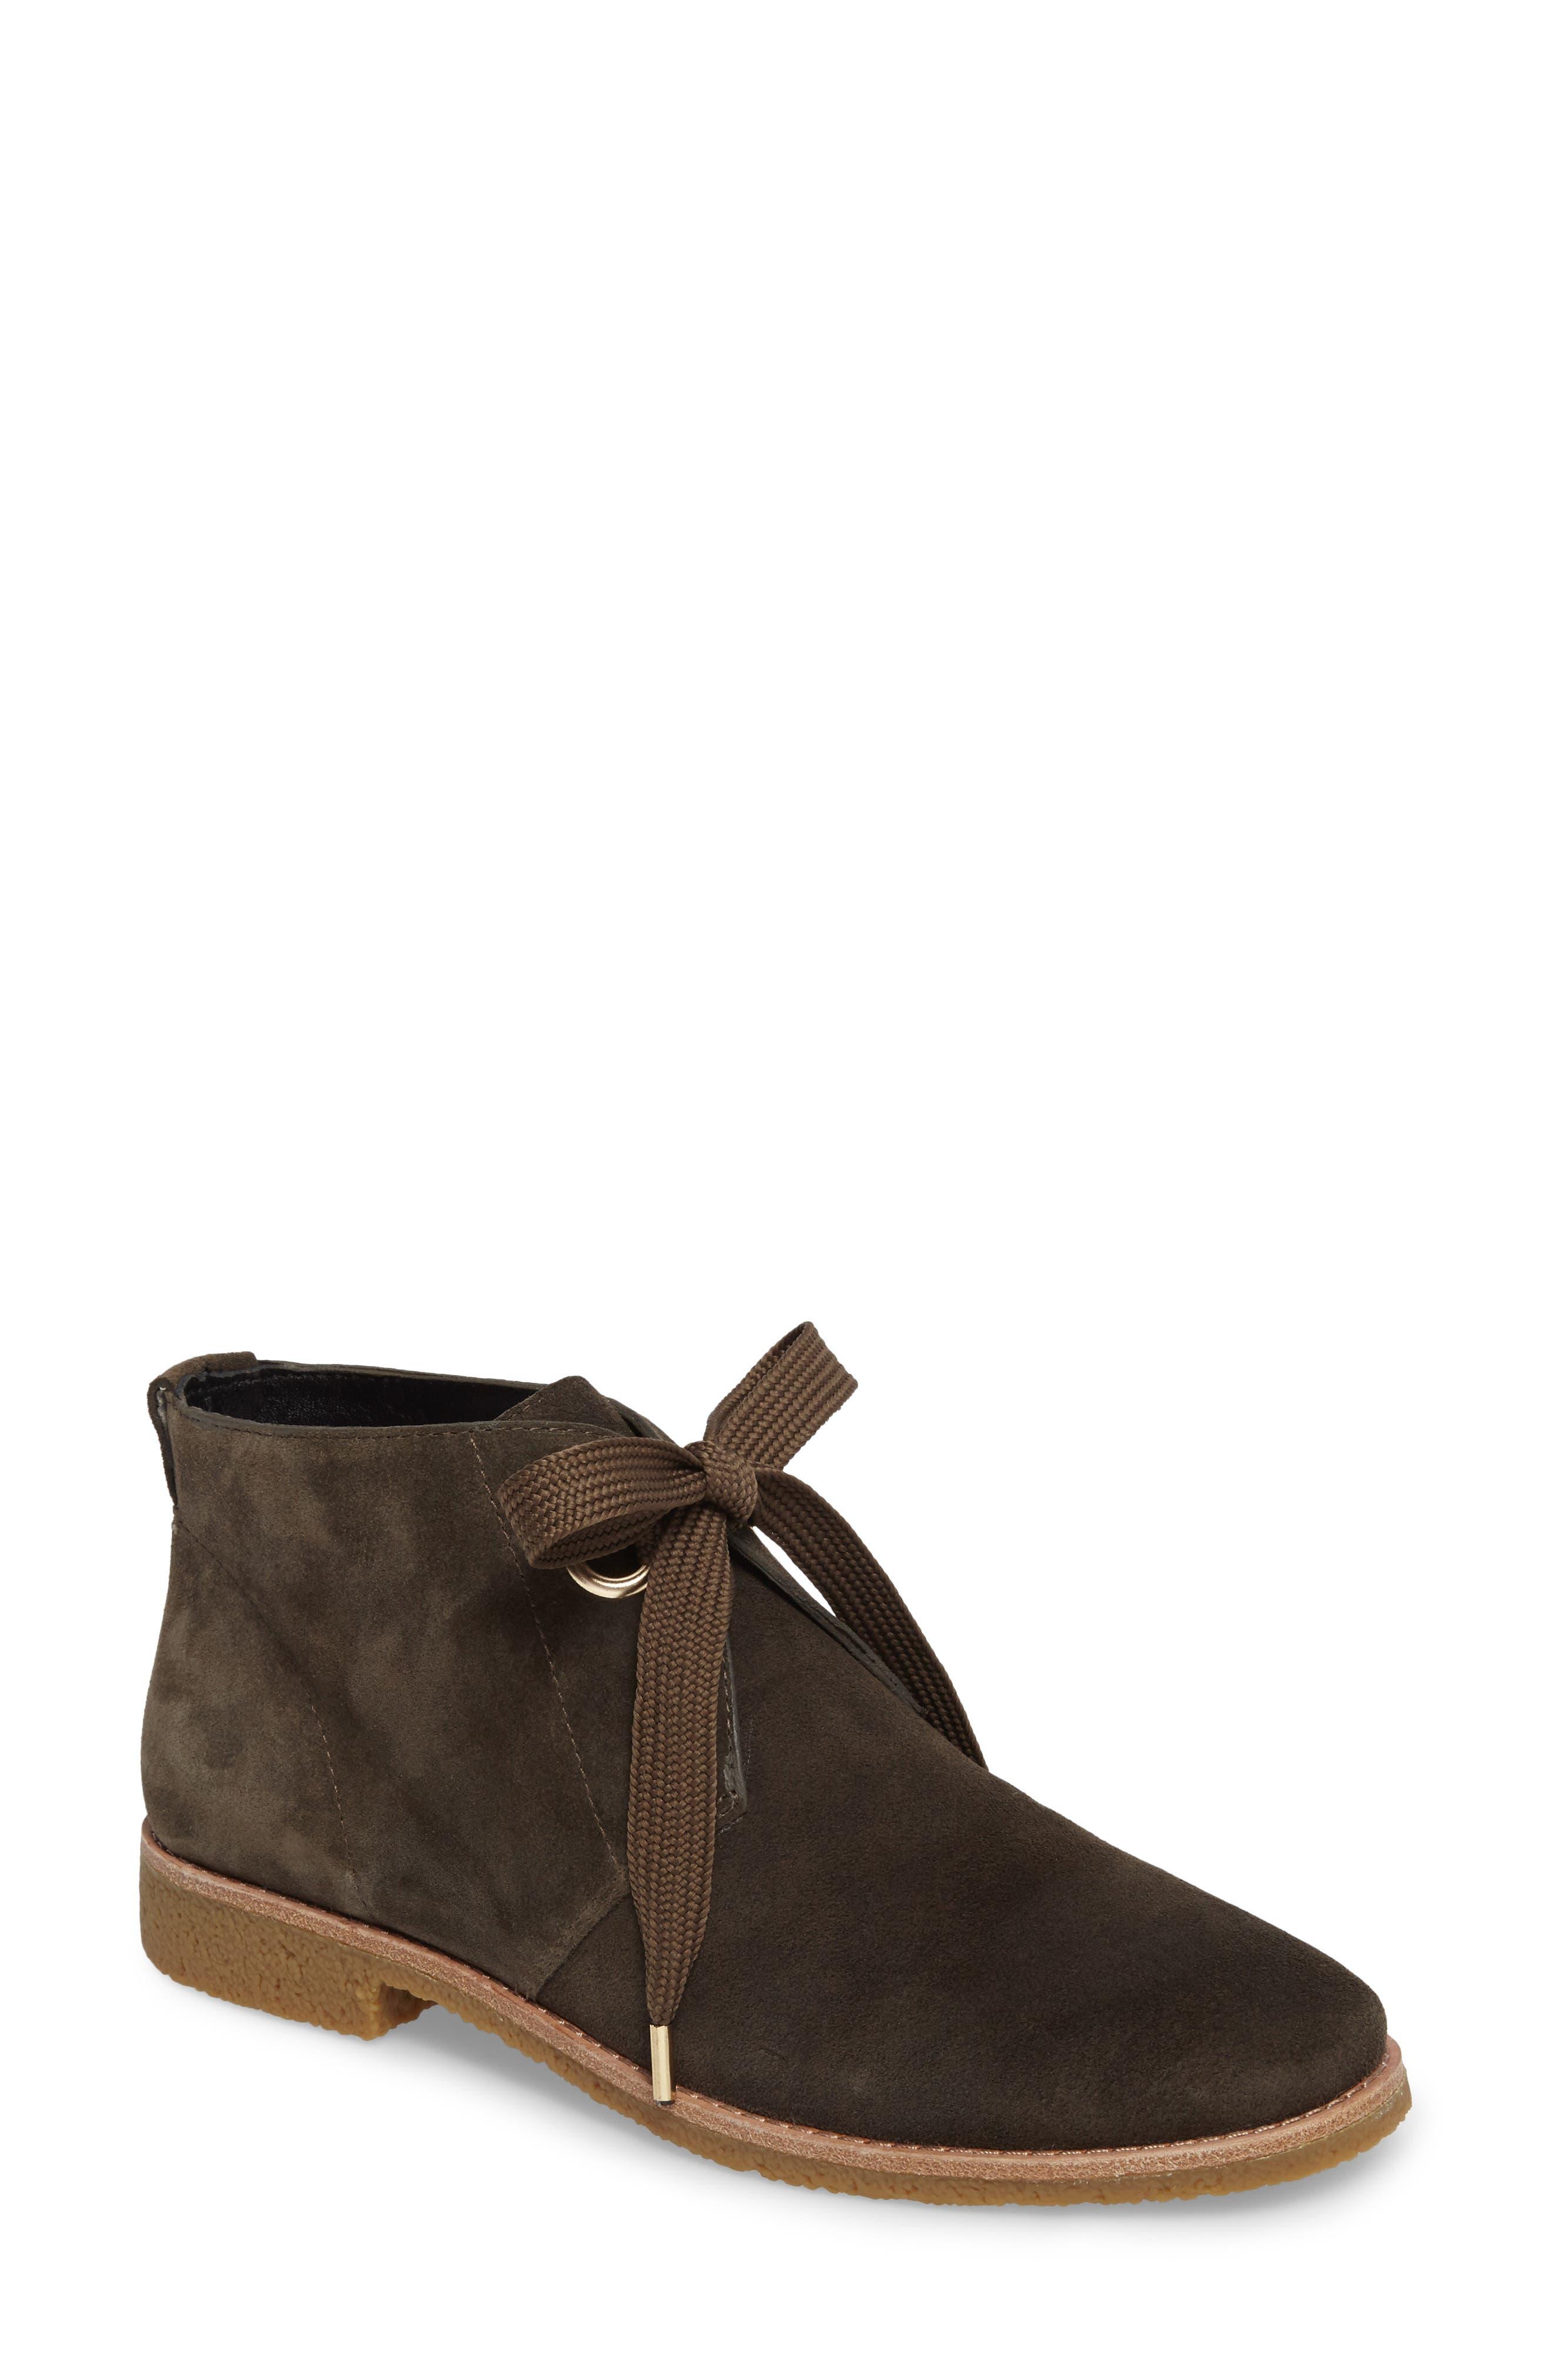 Main Image - kate spade new york barrow chukka boot (Women)